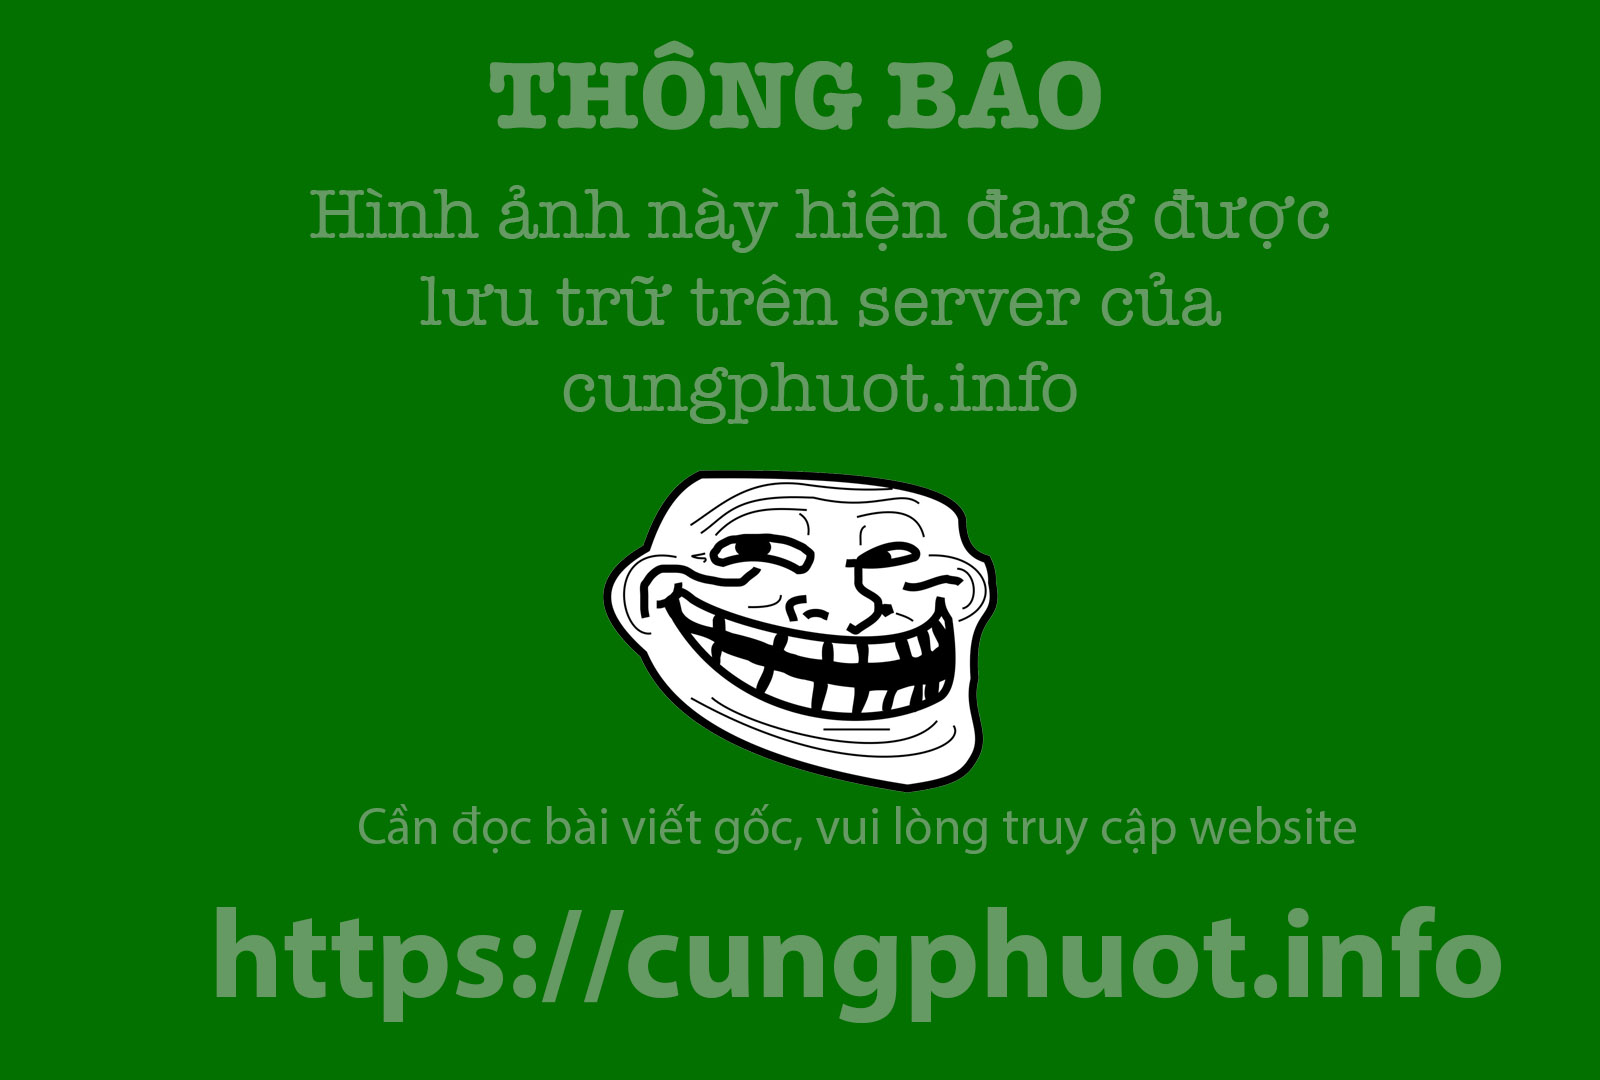 Co do Hue dep la trong suong mu hinh anh 11